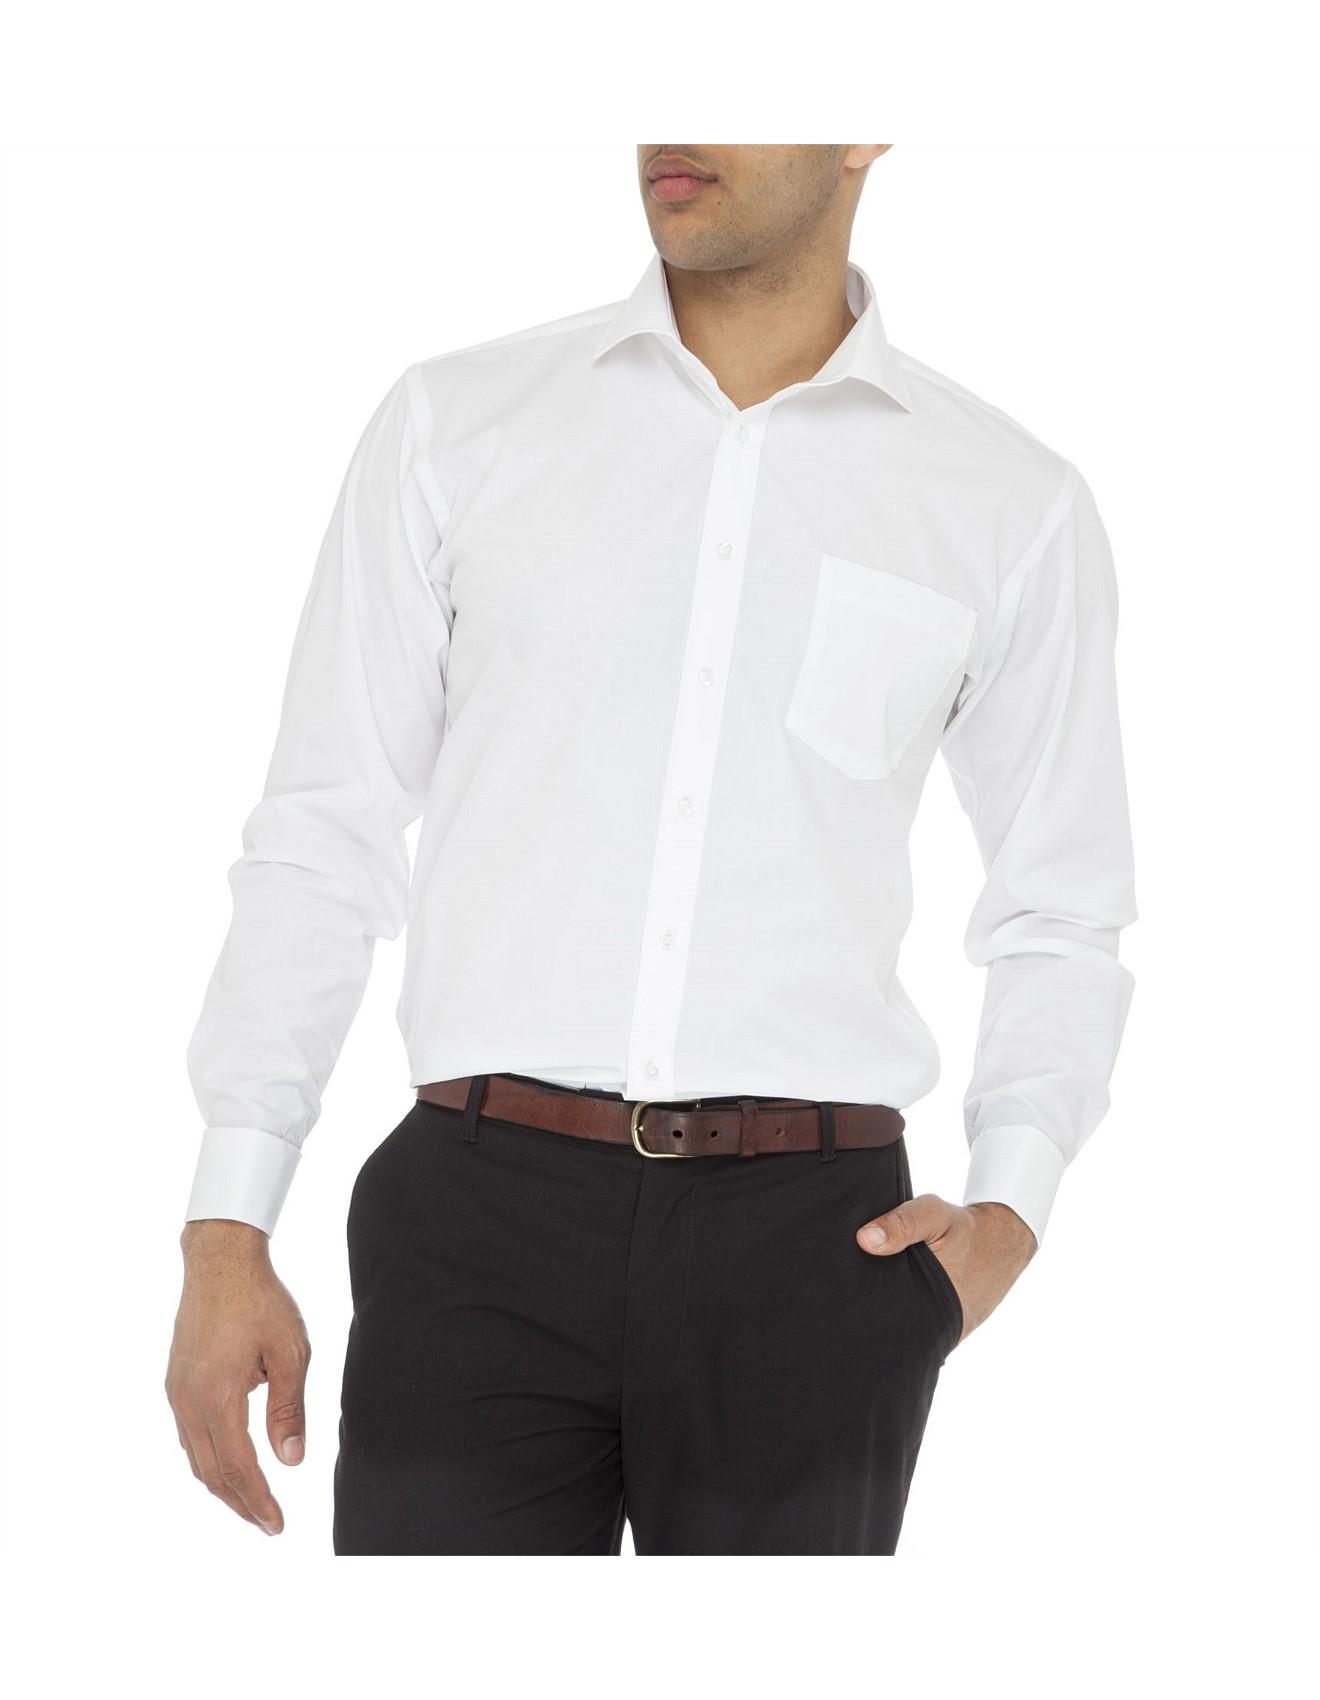 88e531997f80 Luxe Poplin Double Cuff Shirt